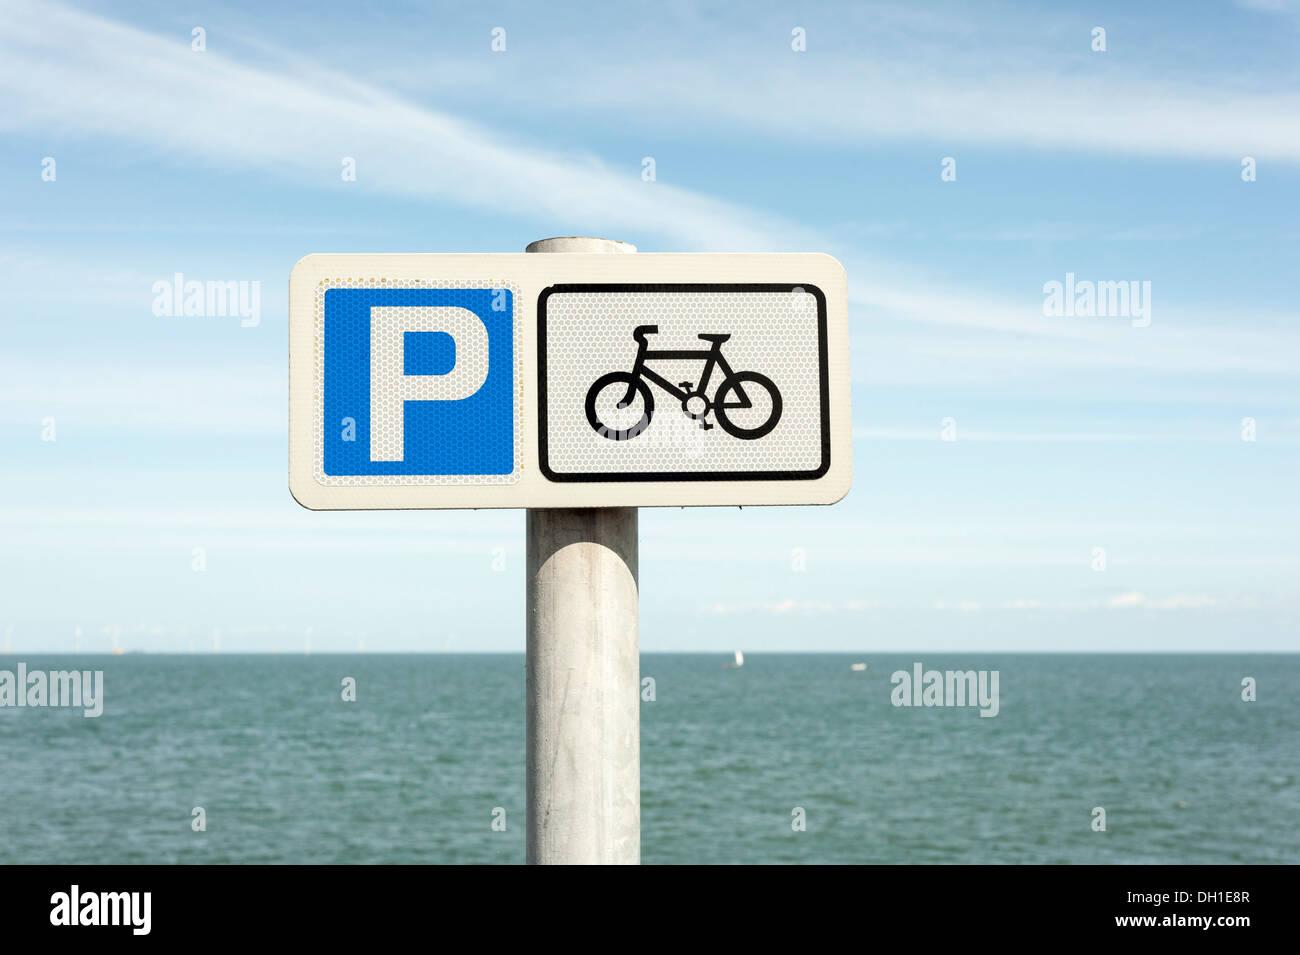 Rhos on Sea-Signs on the Promenade. - Stock Image